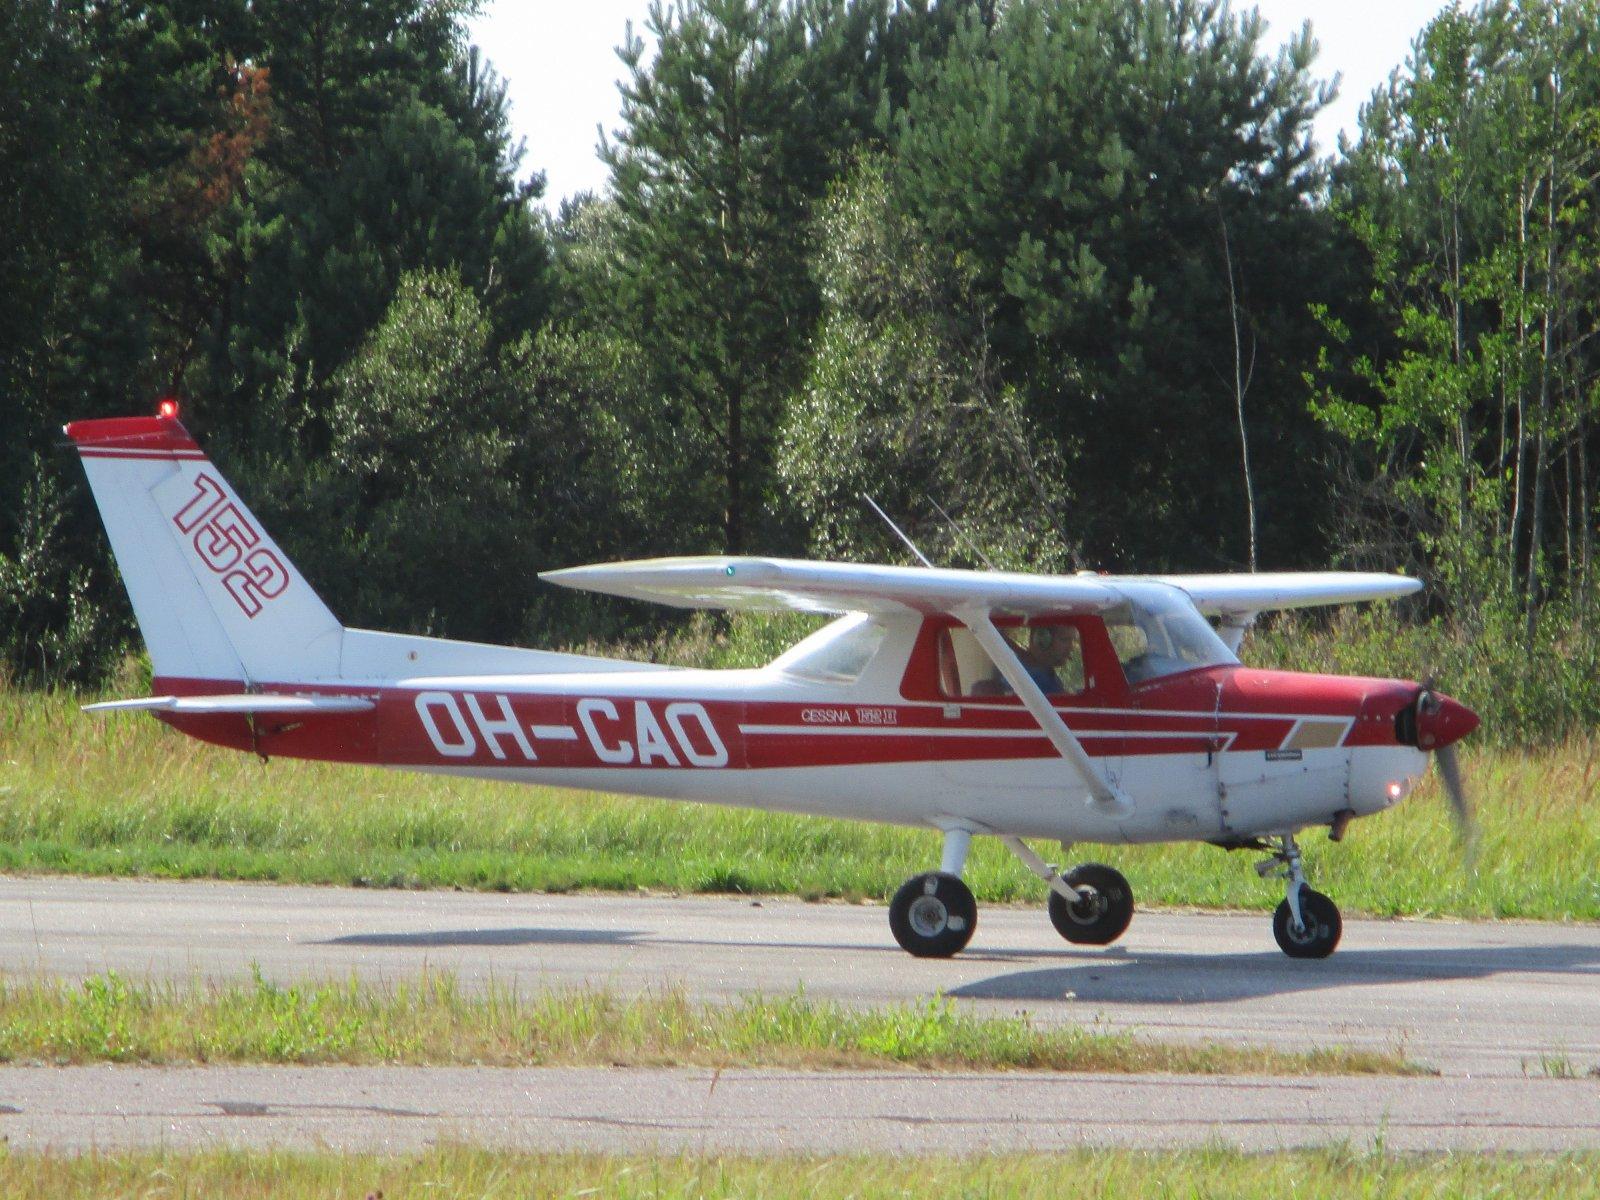 Cessna 152 II OH-CAO EFHN 2019-08-05